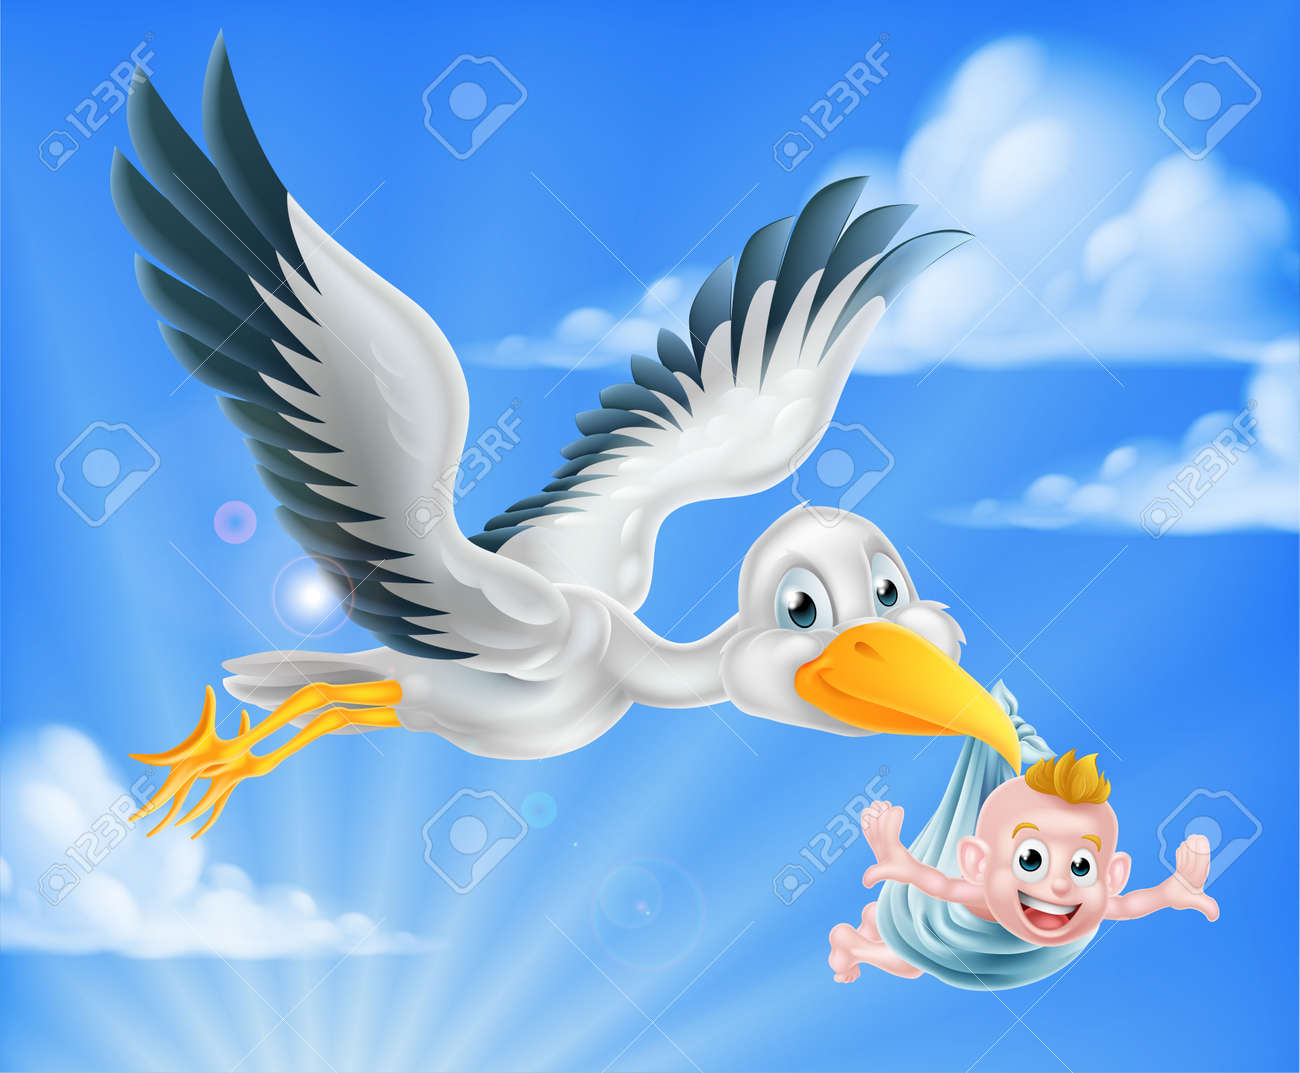 Cartoon stork bird animal character flying through the sky holding a newborn baby. Classic myth of stork bird delivering a new born baby - 59995250